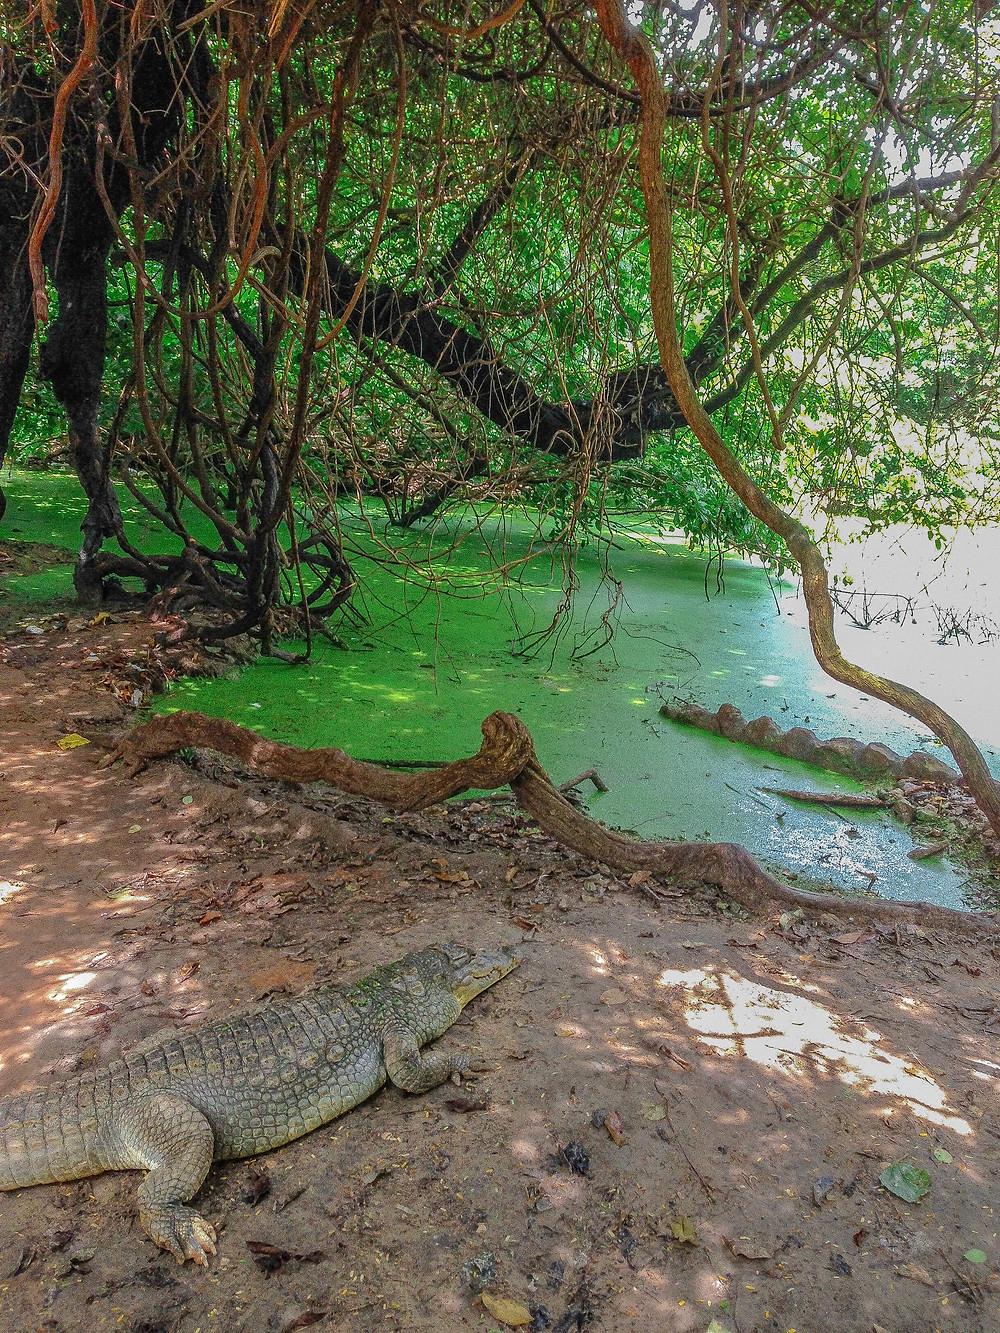 Gambia-Urlaub-Reisebericht-Katchikally-Krokodil